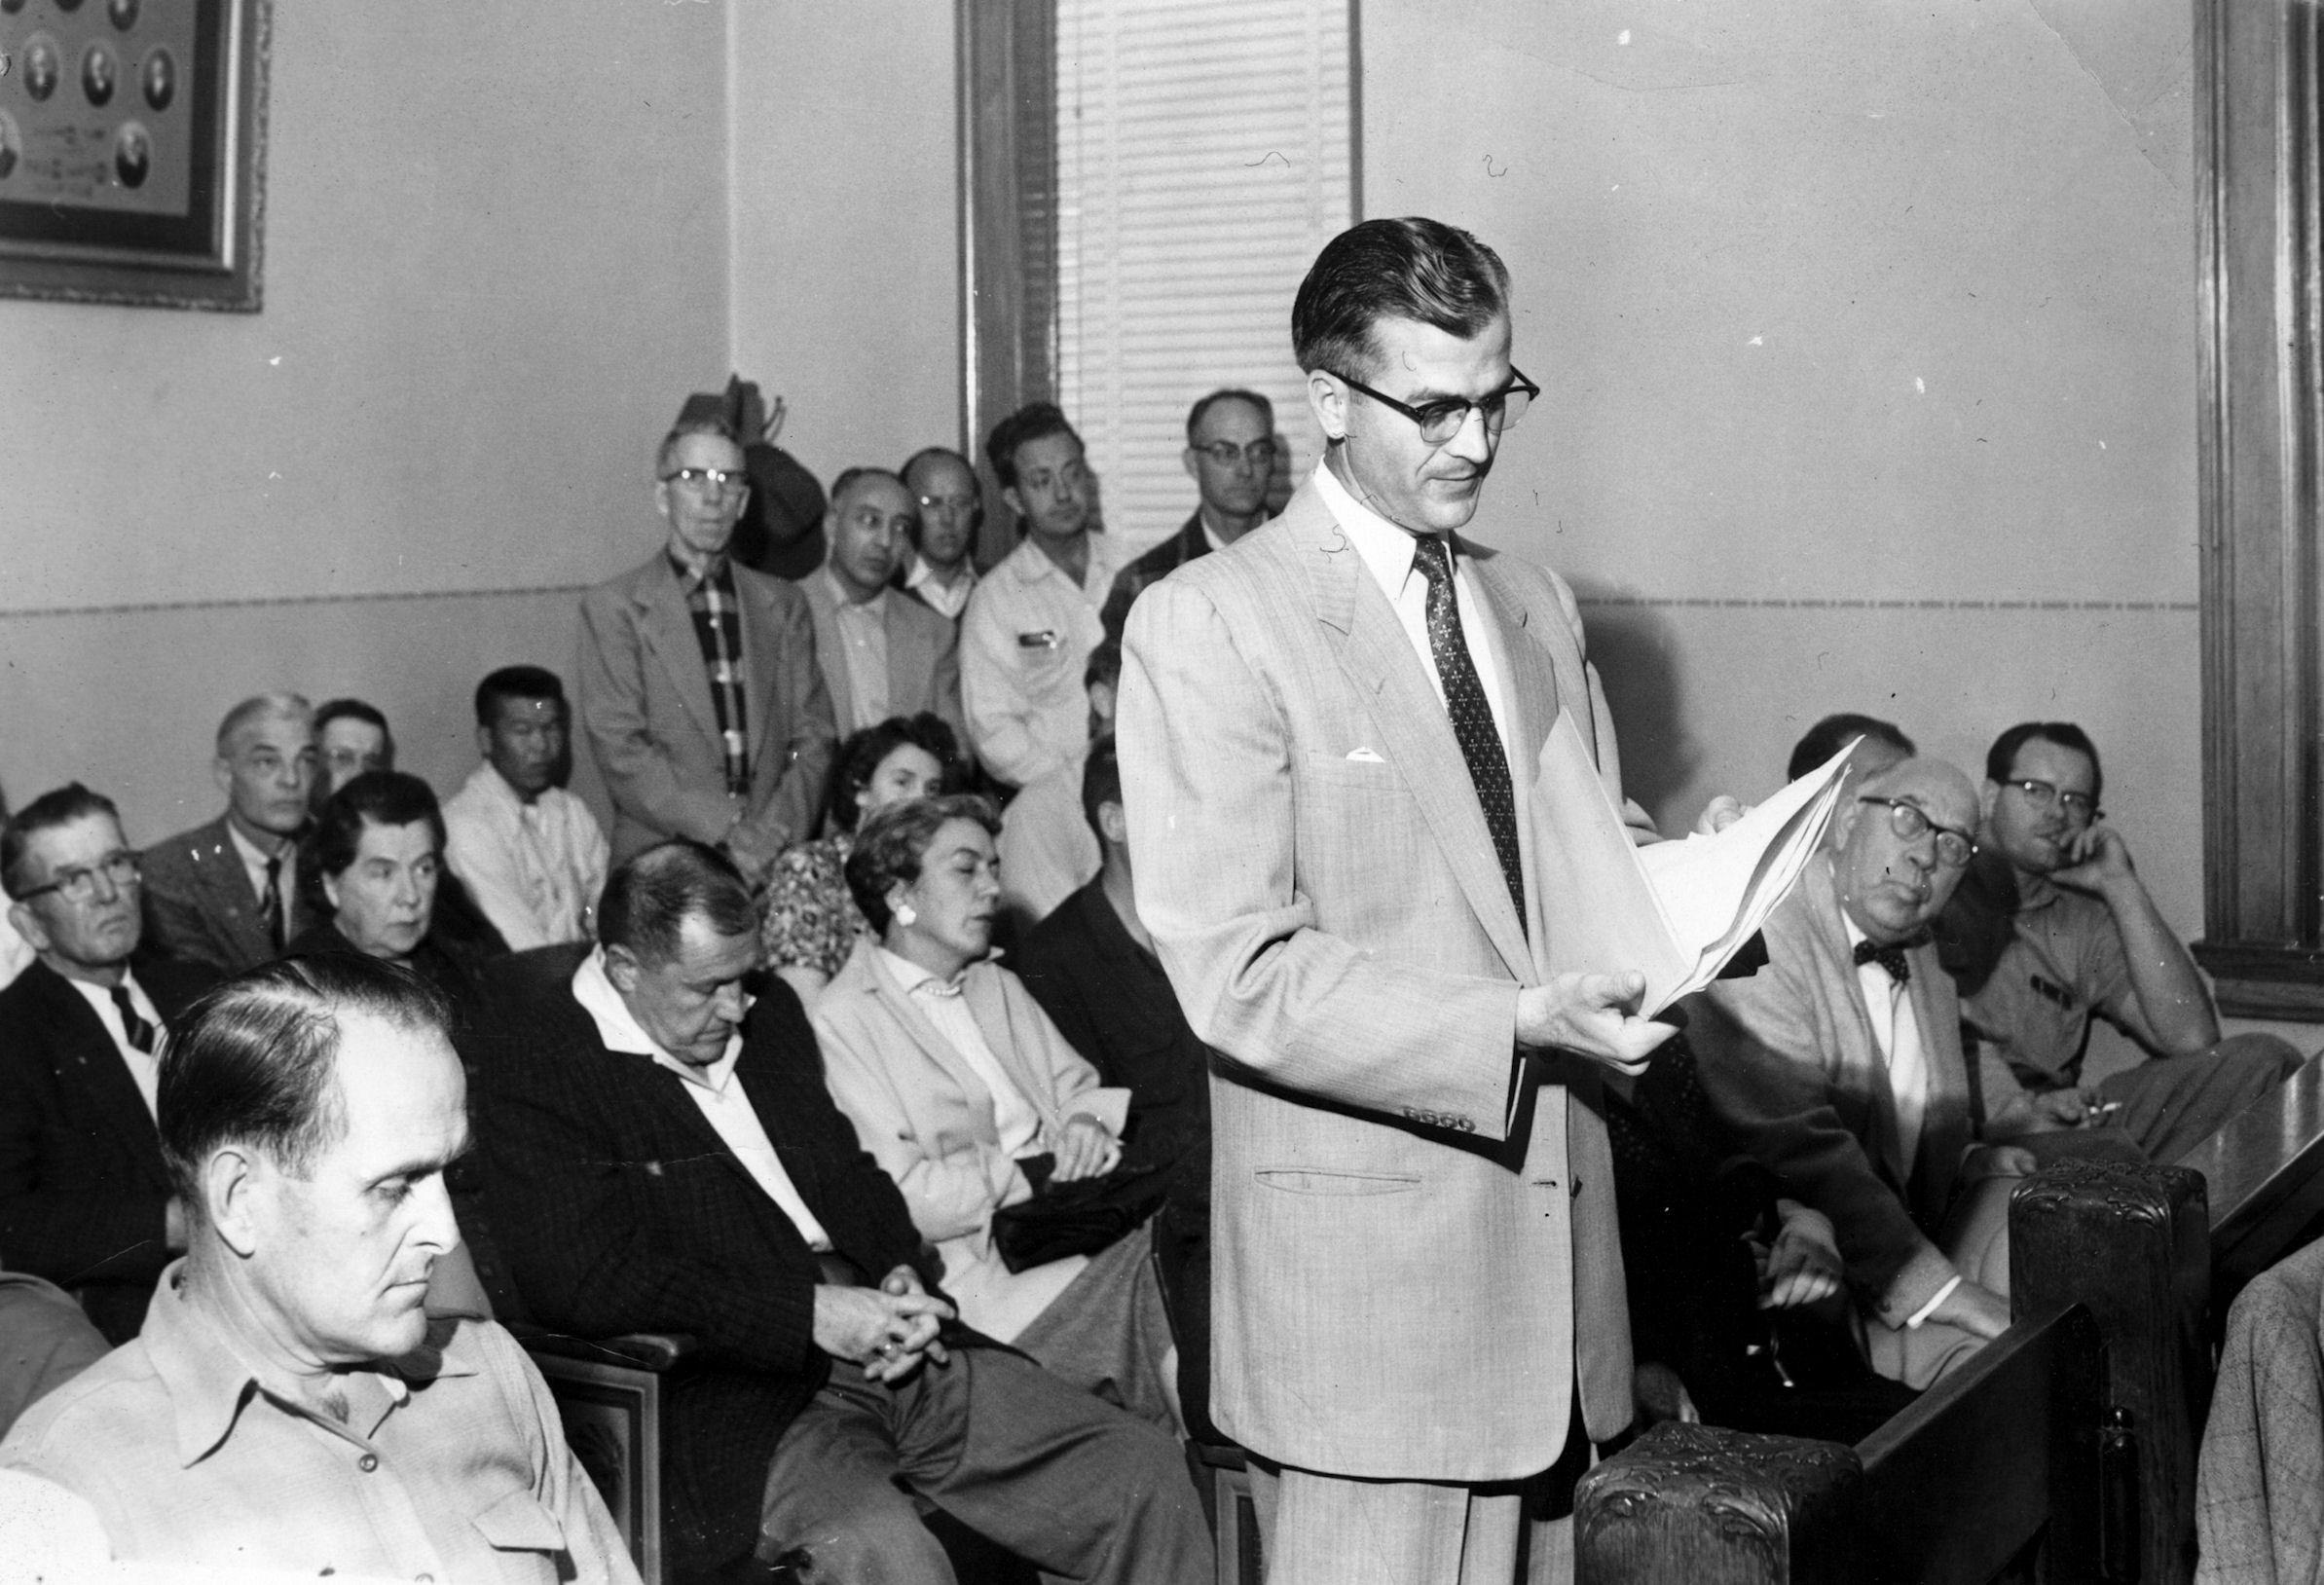 Garden Grove incorporation hearing, ca 1955.